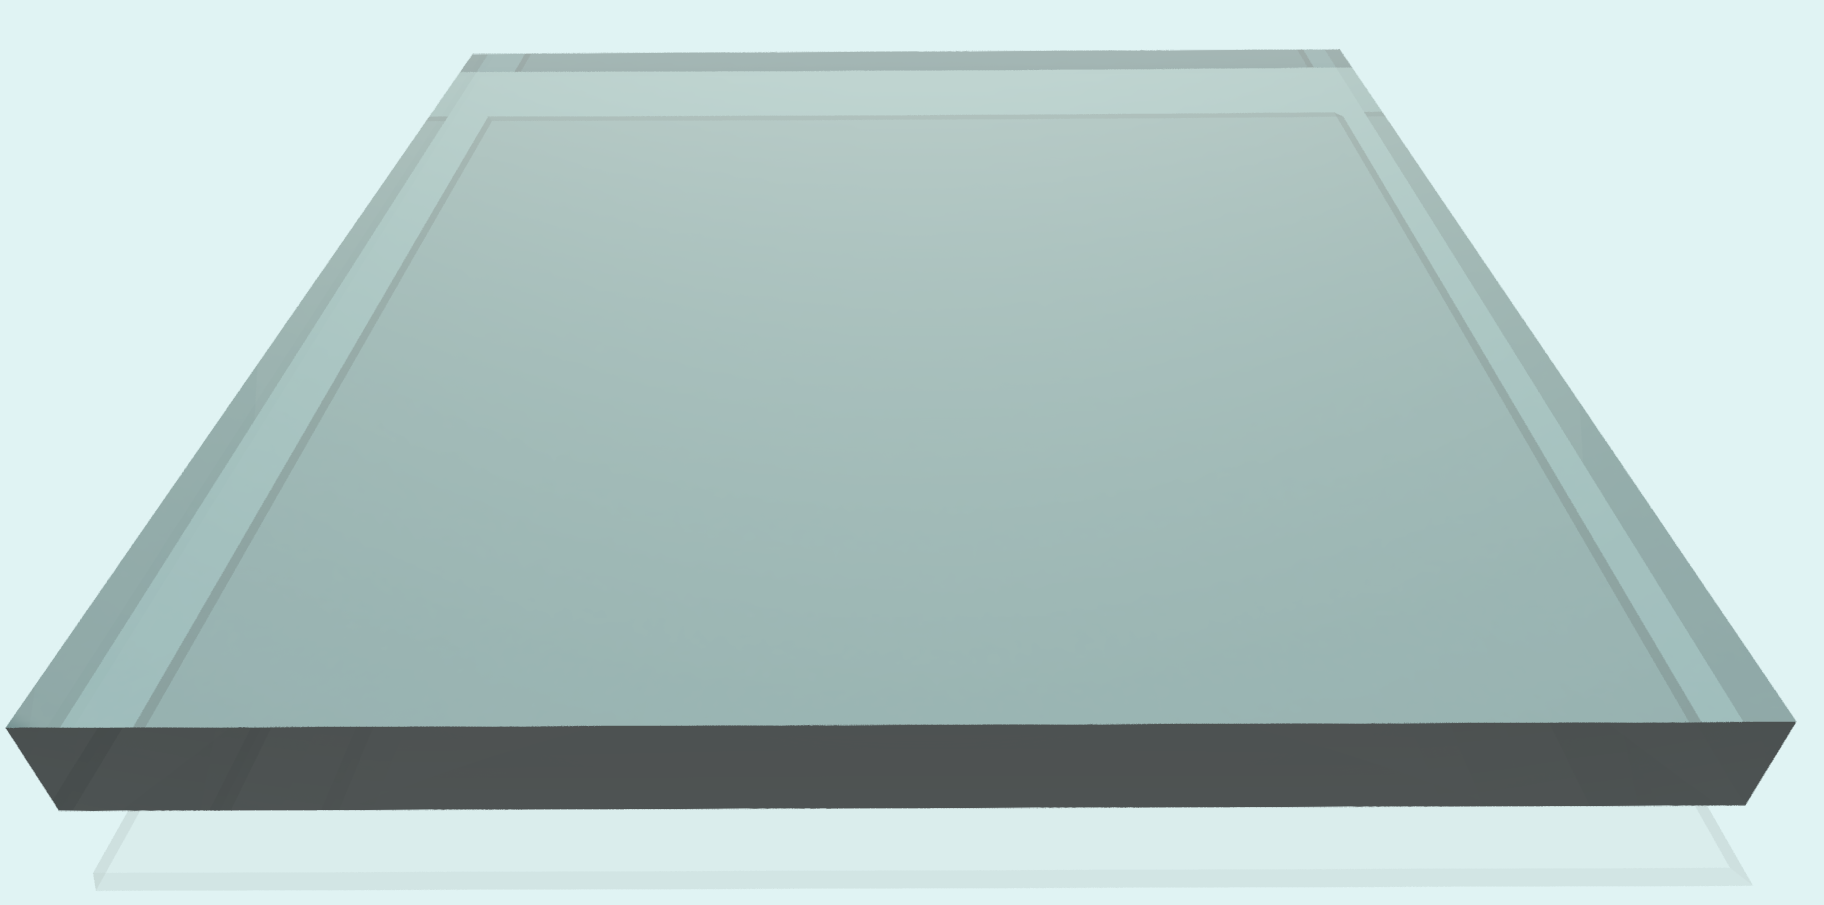 Simolux PET 15 mm, klar